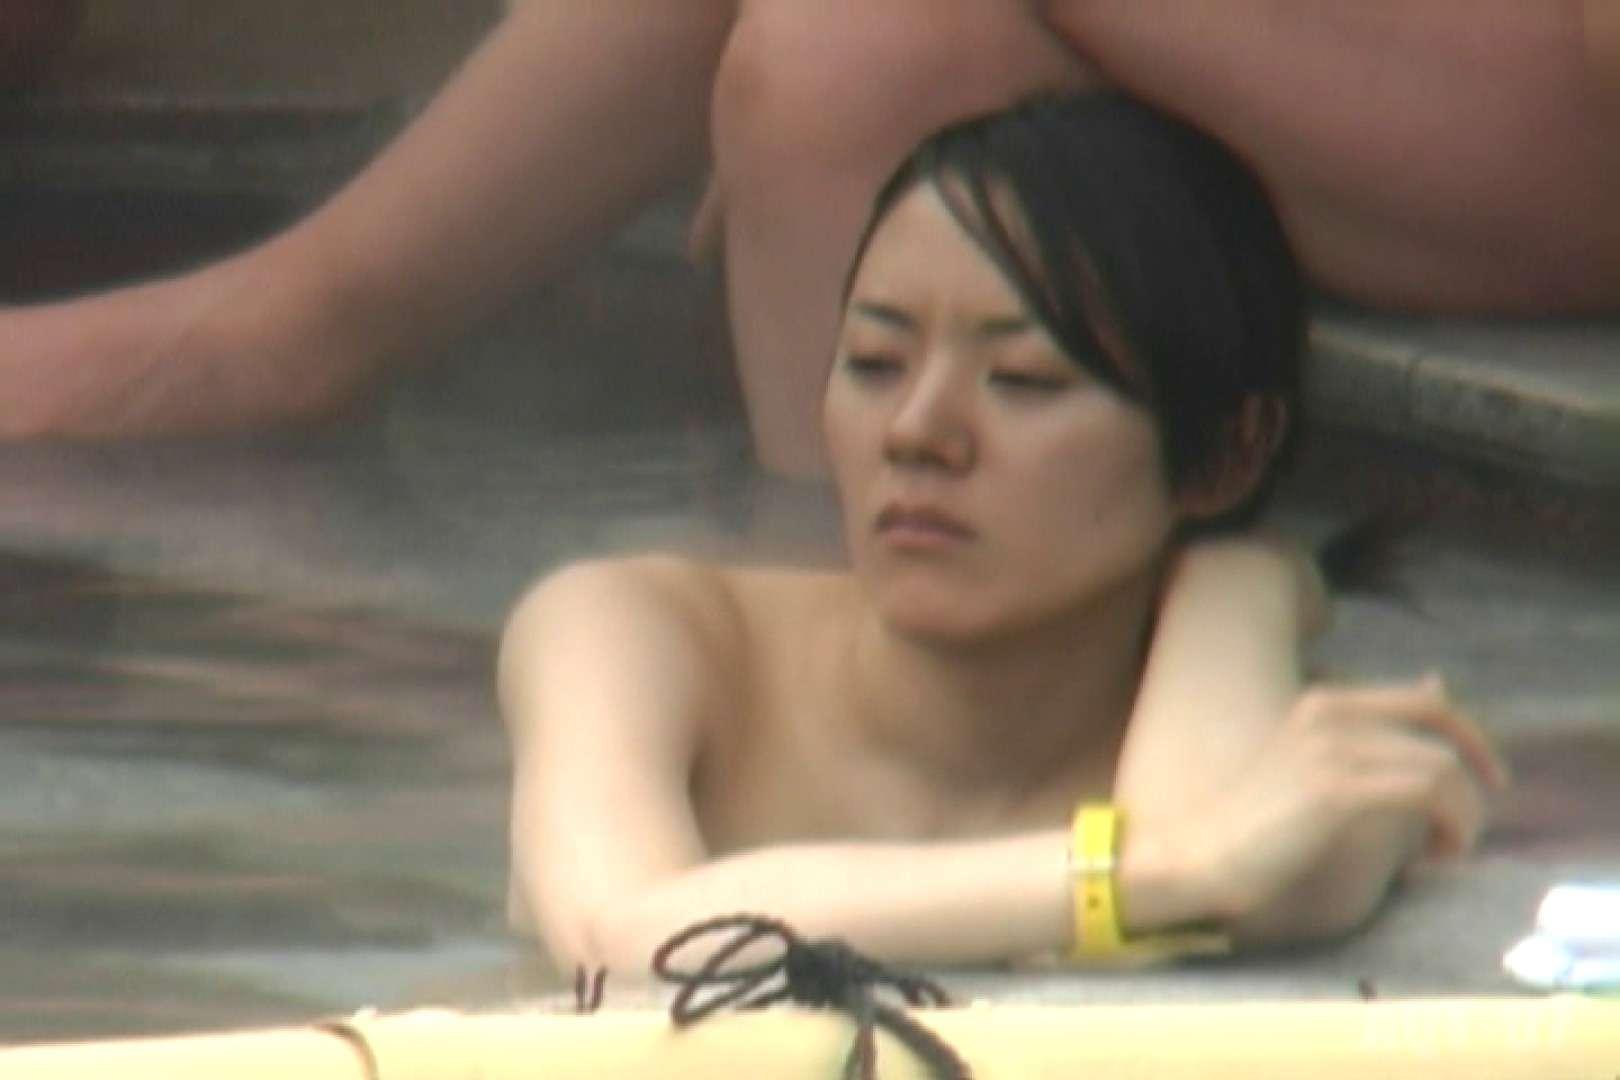 Aquaな露天風呂Vol.765 露天風呂編  99PIX 30